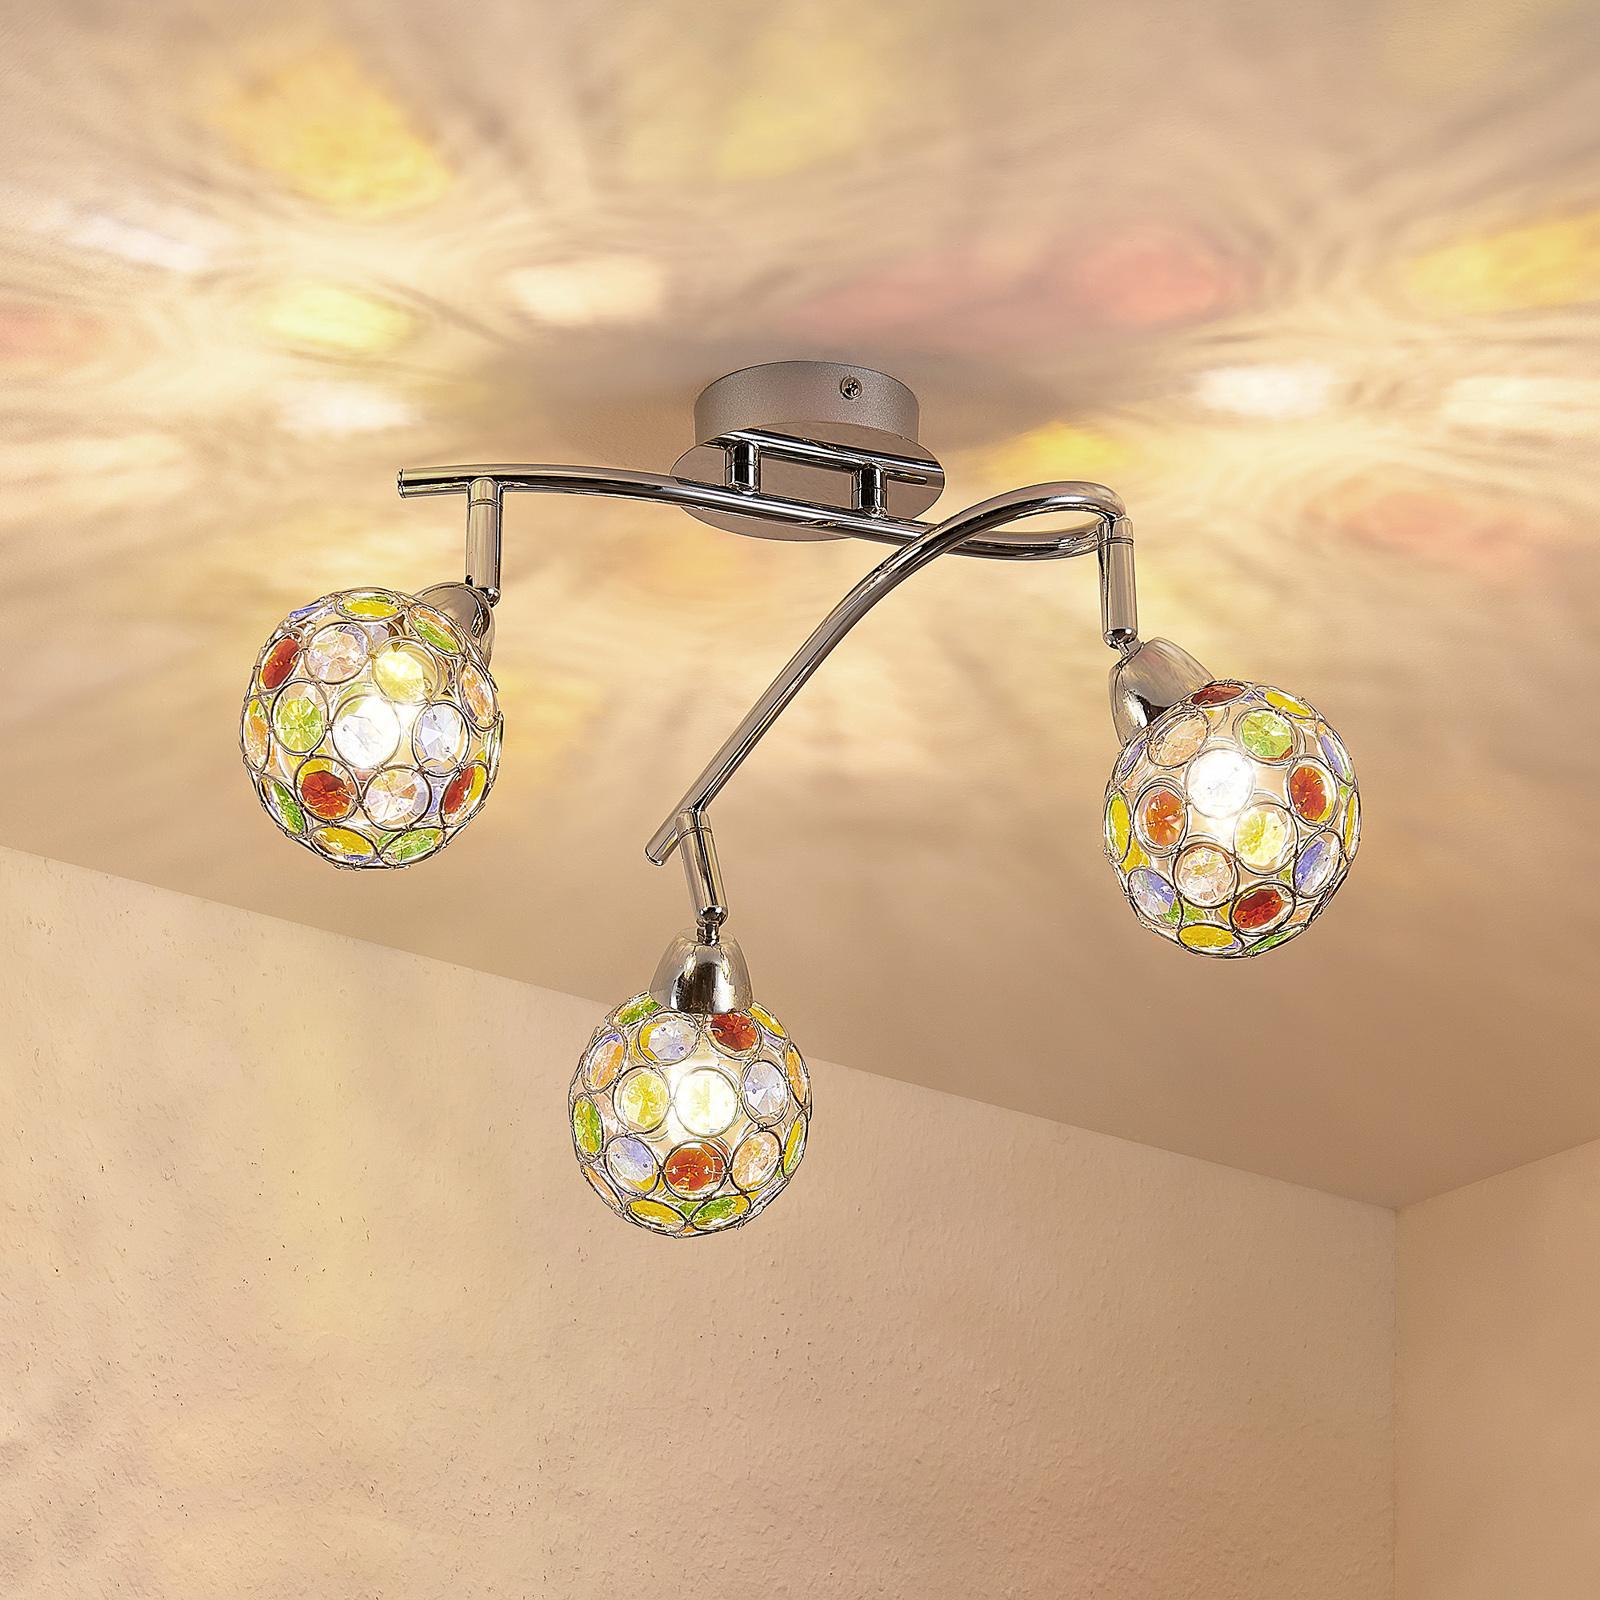 Lindby Dottys plafonnier à 3 lampes